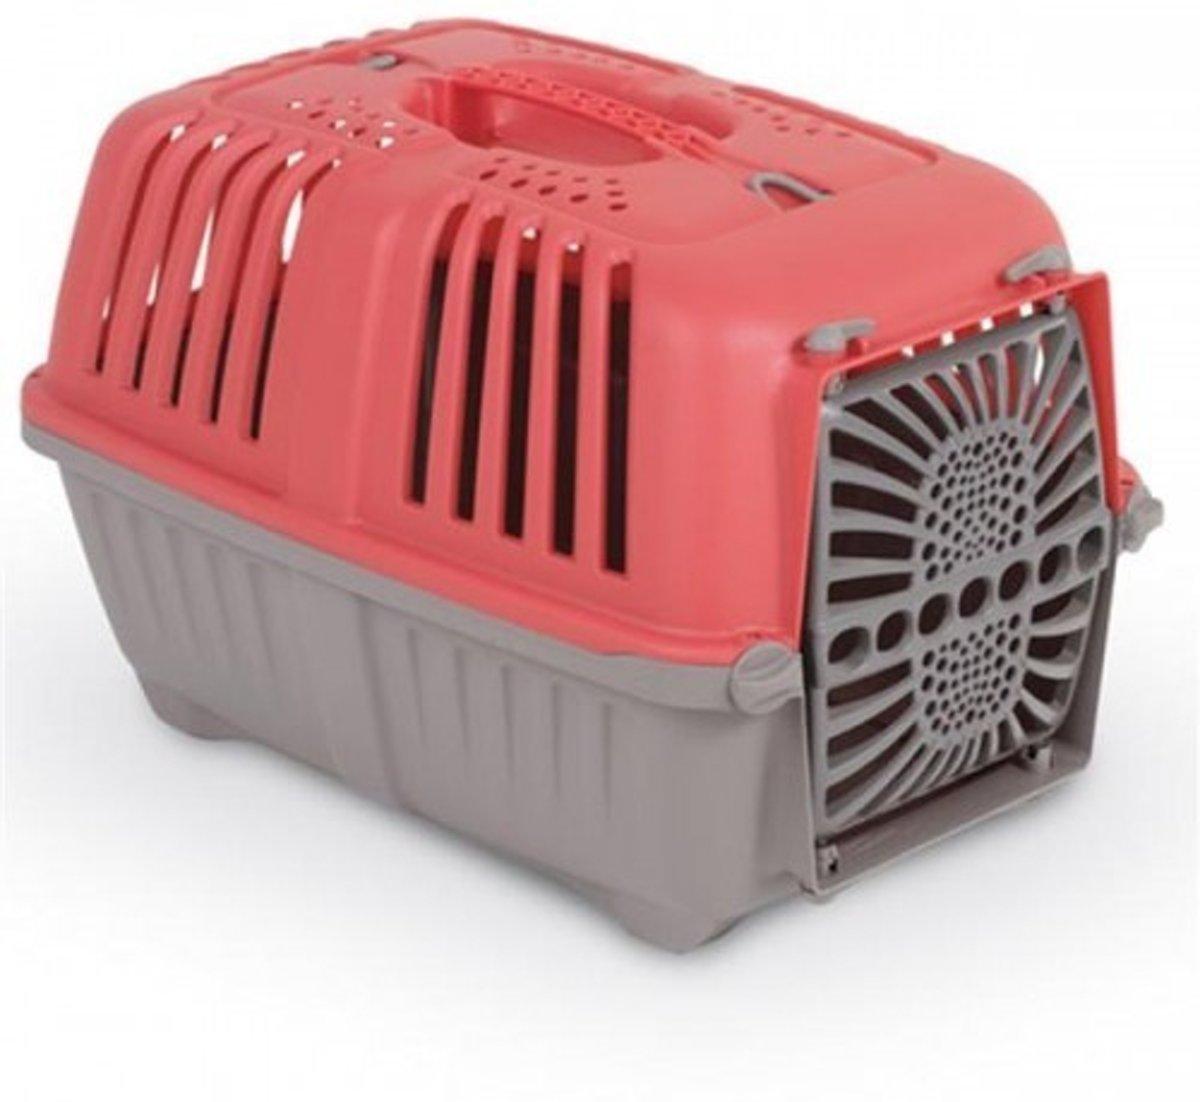 Afbeelding van product Transportbox Voyage rood grijs